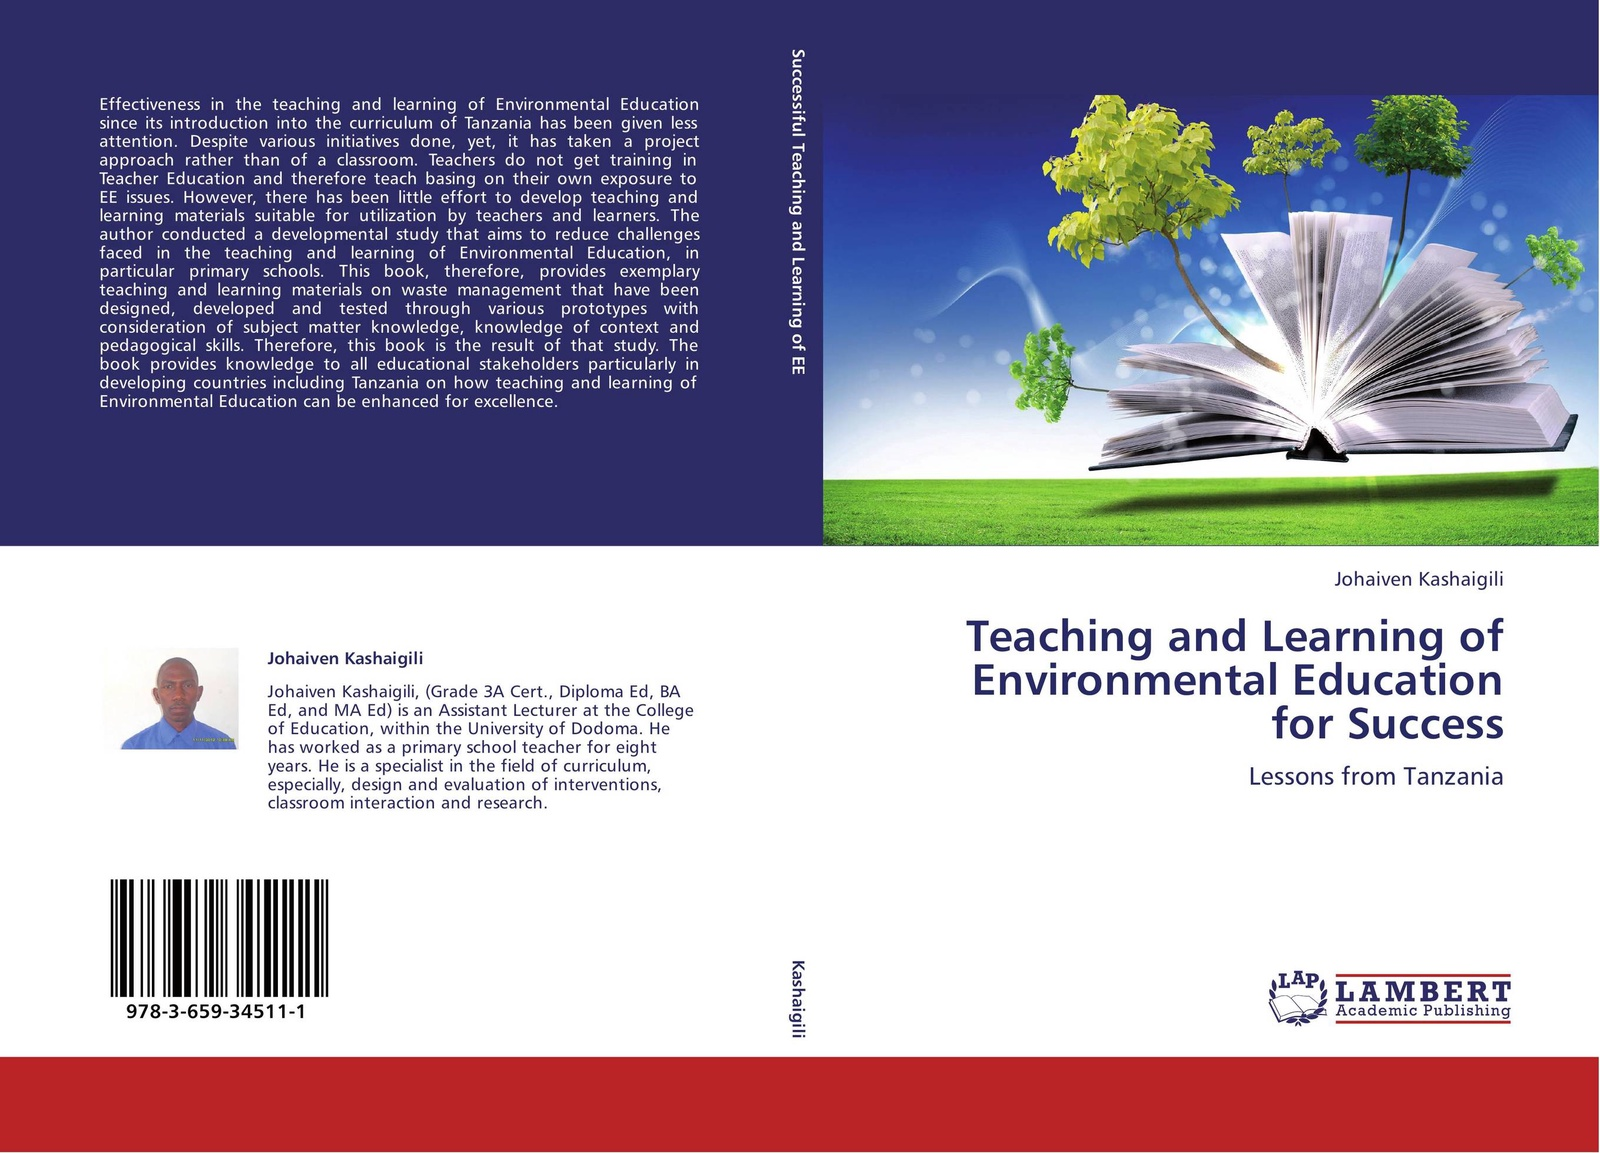 Johaiven Kashaigili Teaching and Learning of Environmental Education for Success joel kayombo education for all in tanzania achievements and shortfalls